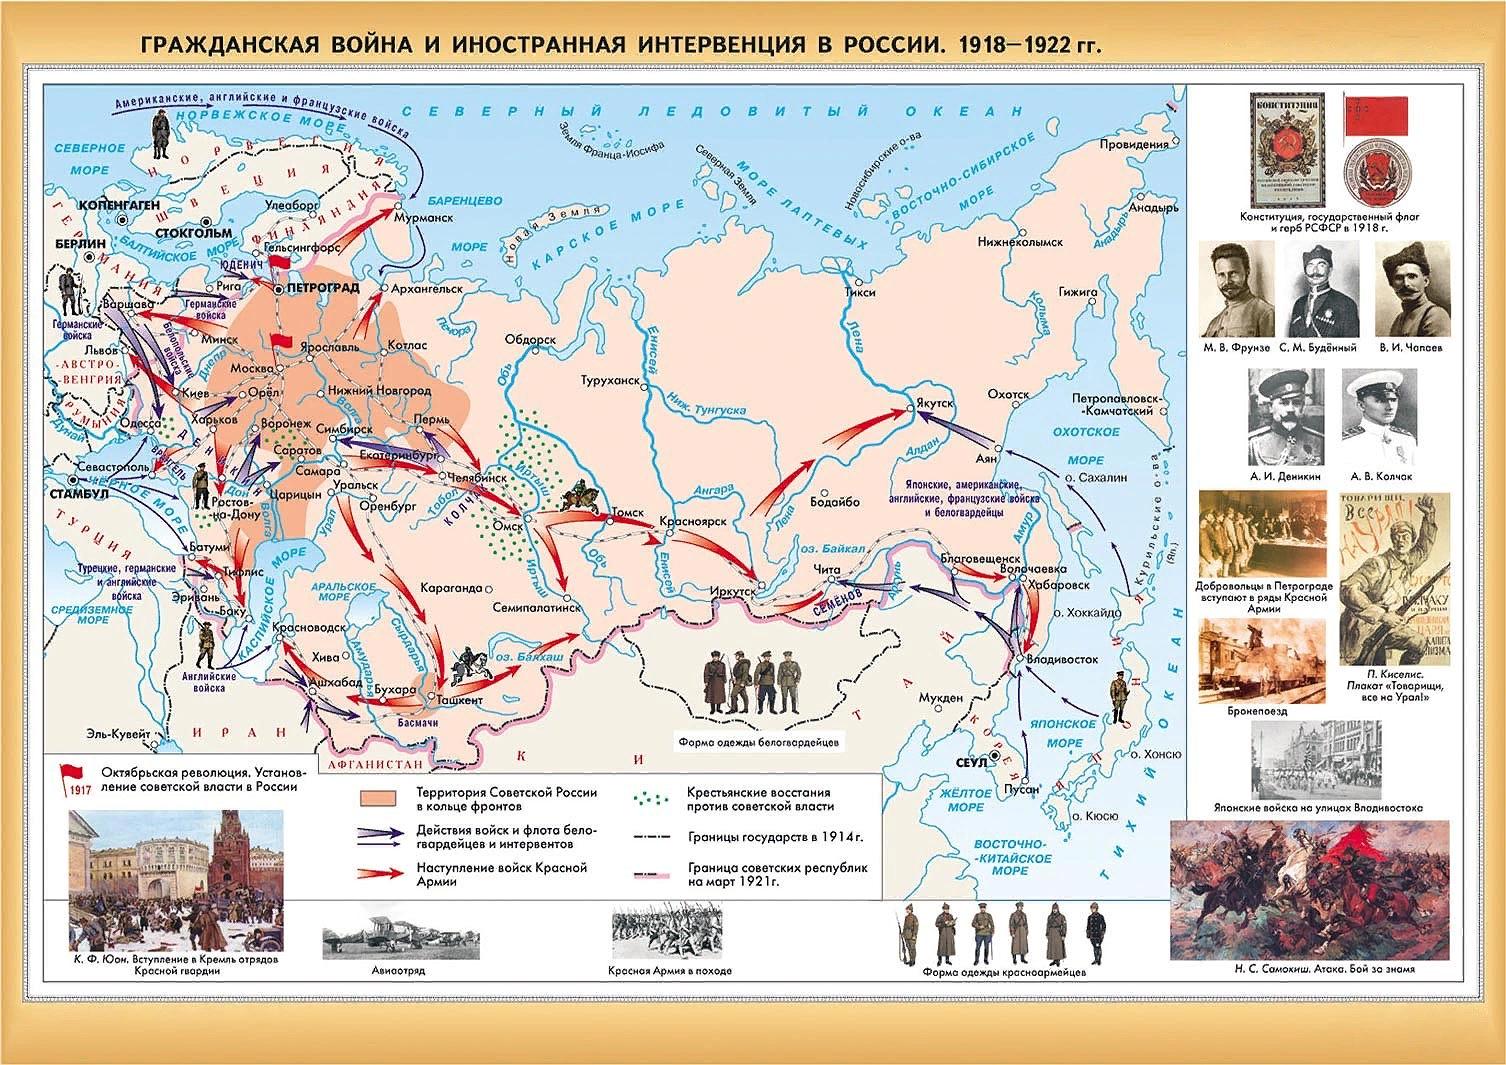 карта интервенции 1918-22 гг.